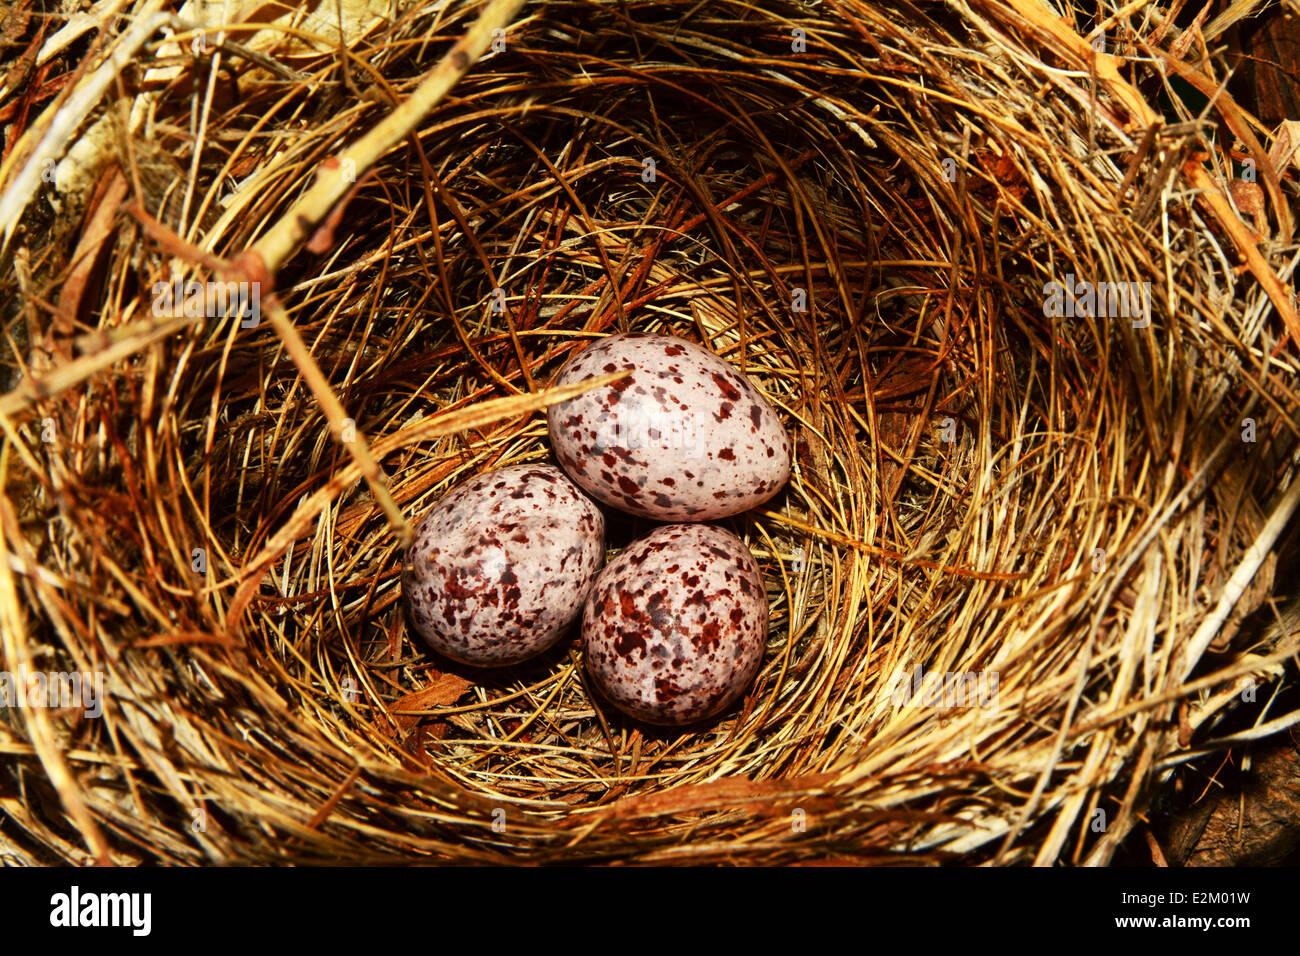 Songbird nest with three eggs - Stock Image